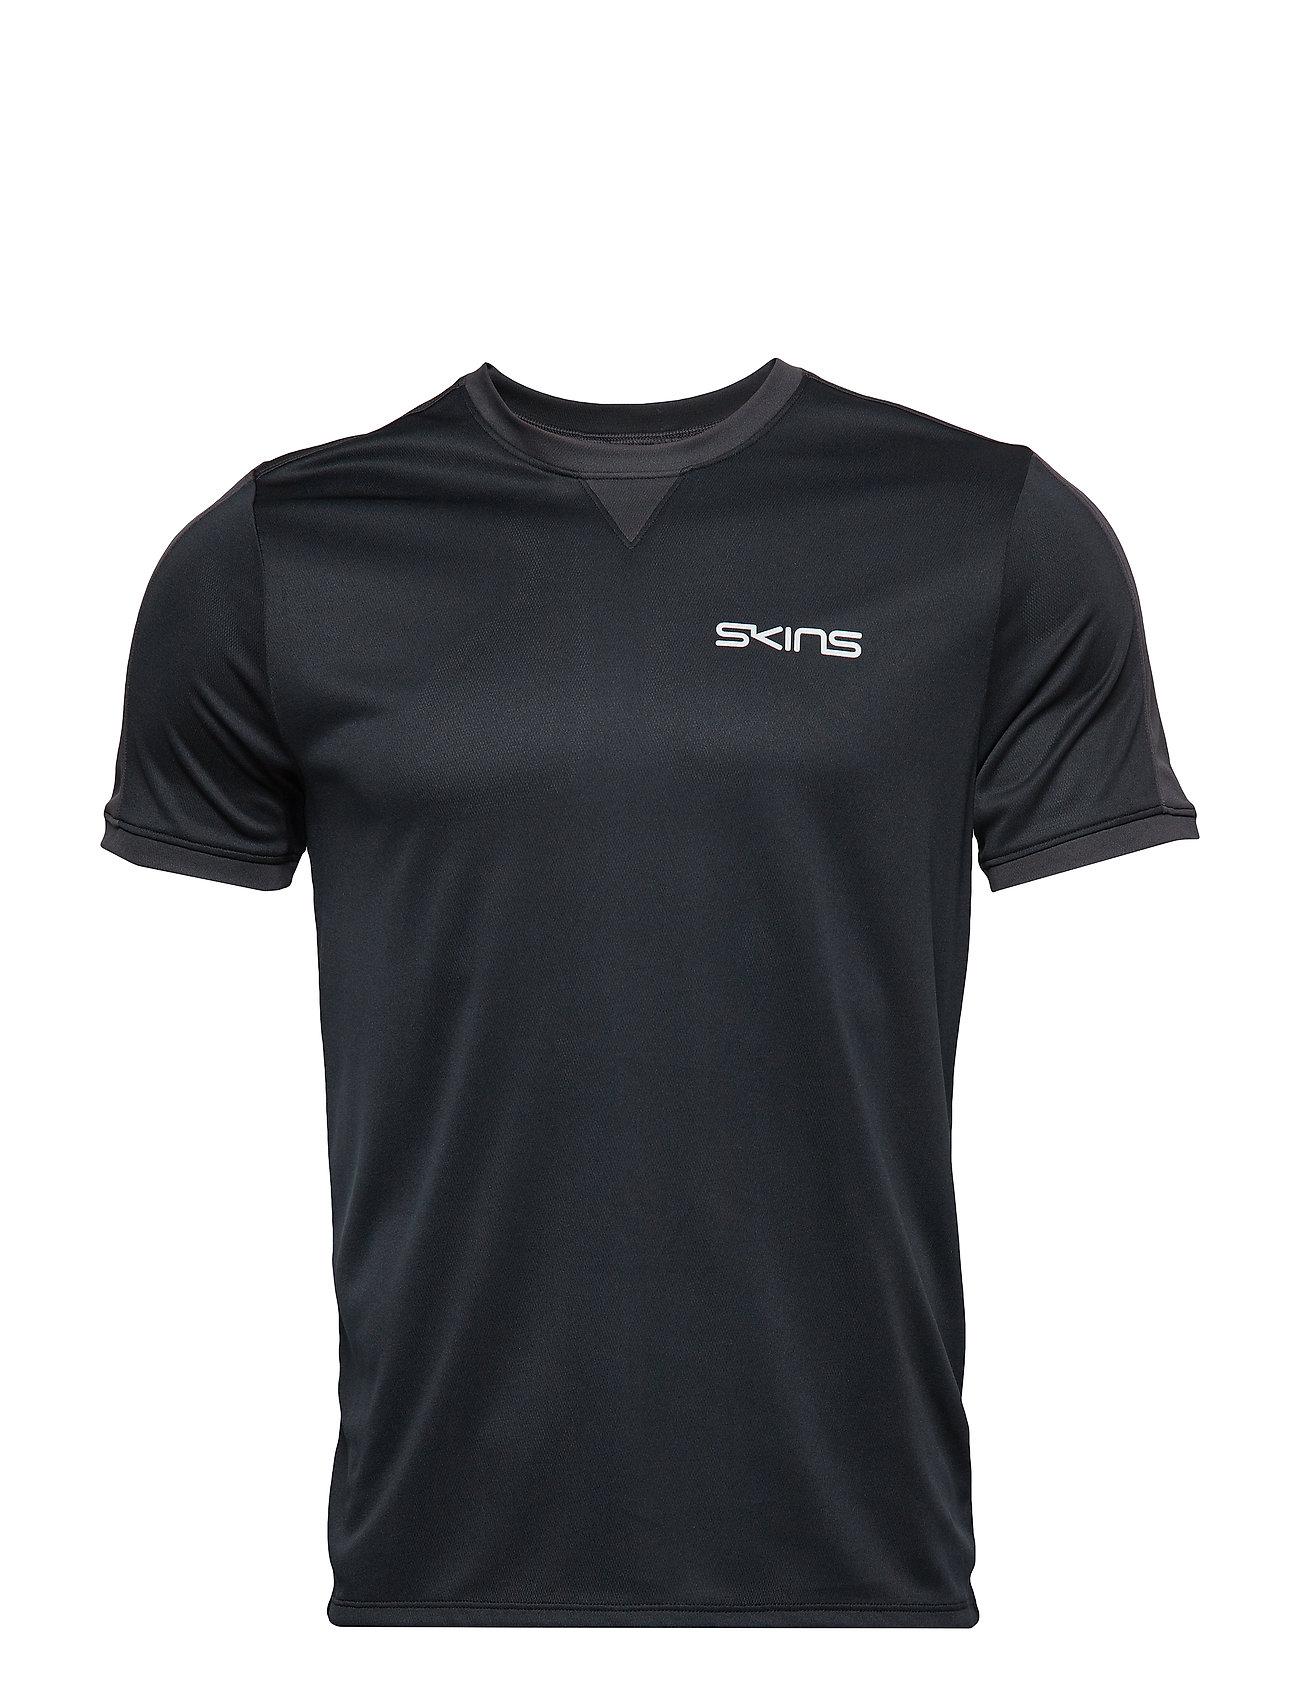 Skins Activewear Sveg Mens Training Top S/S Round Neck